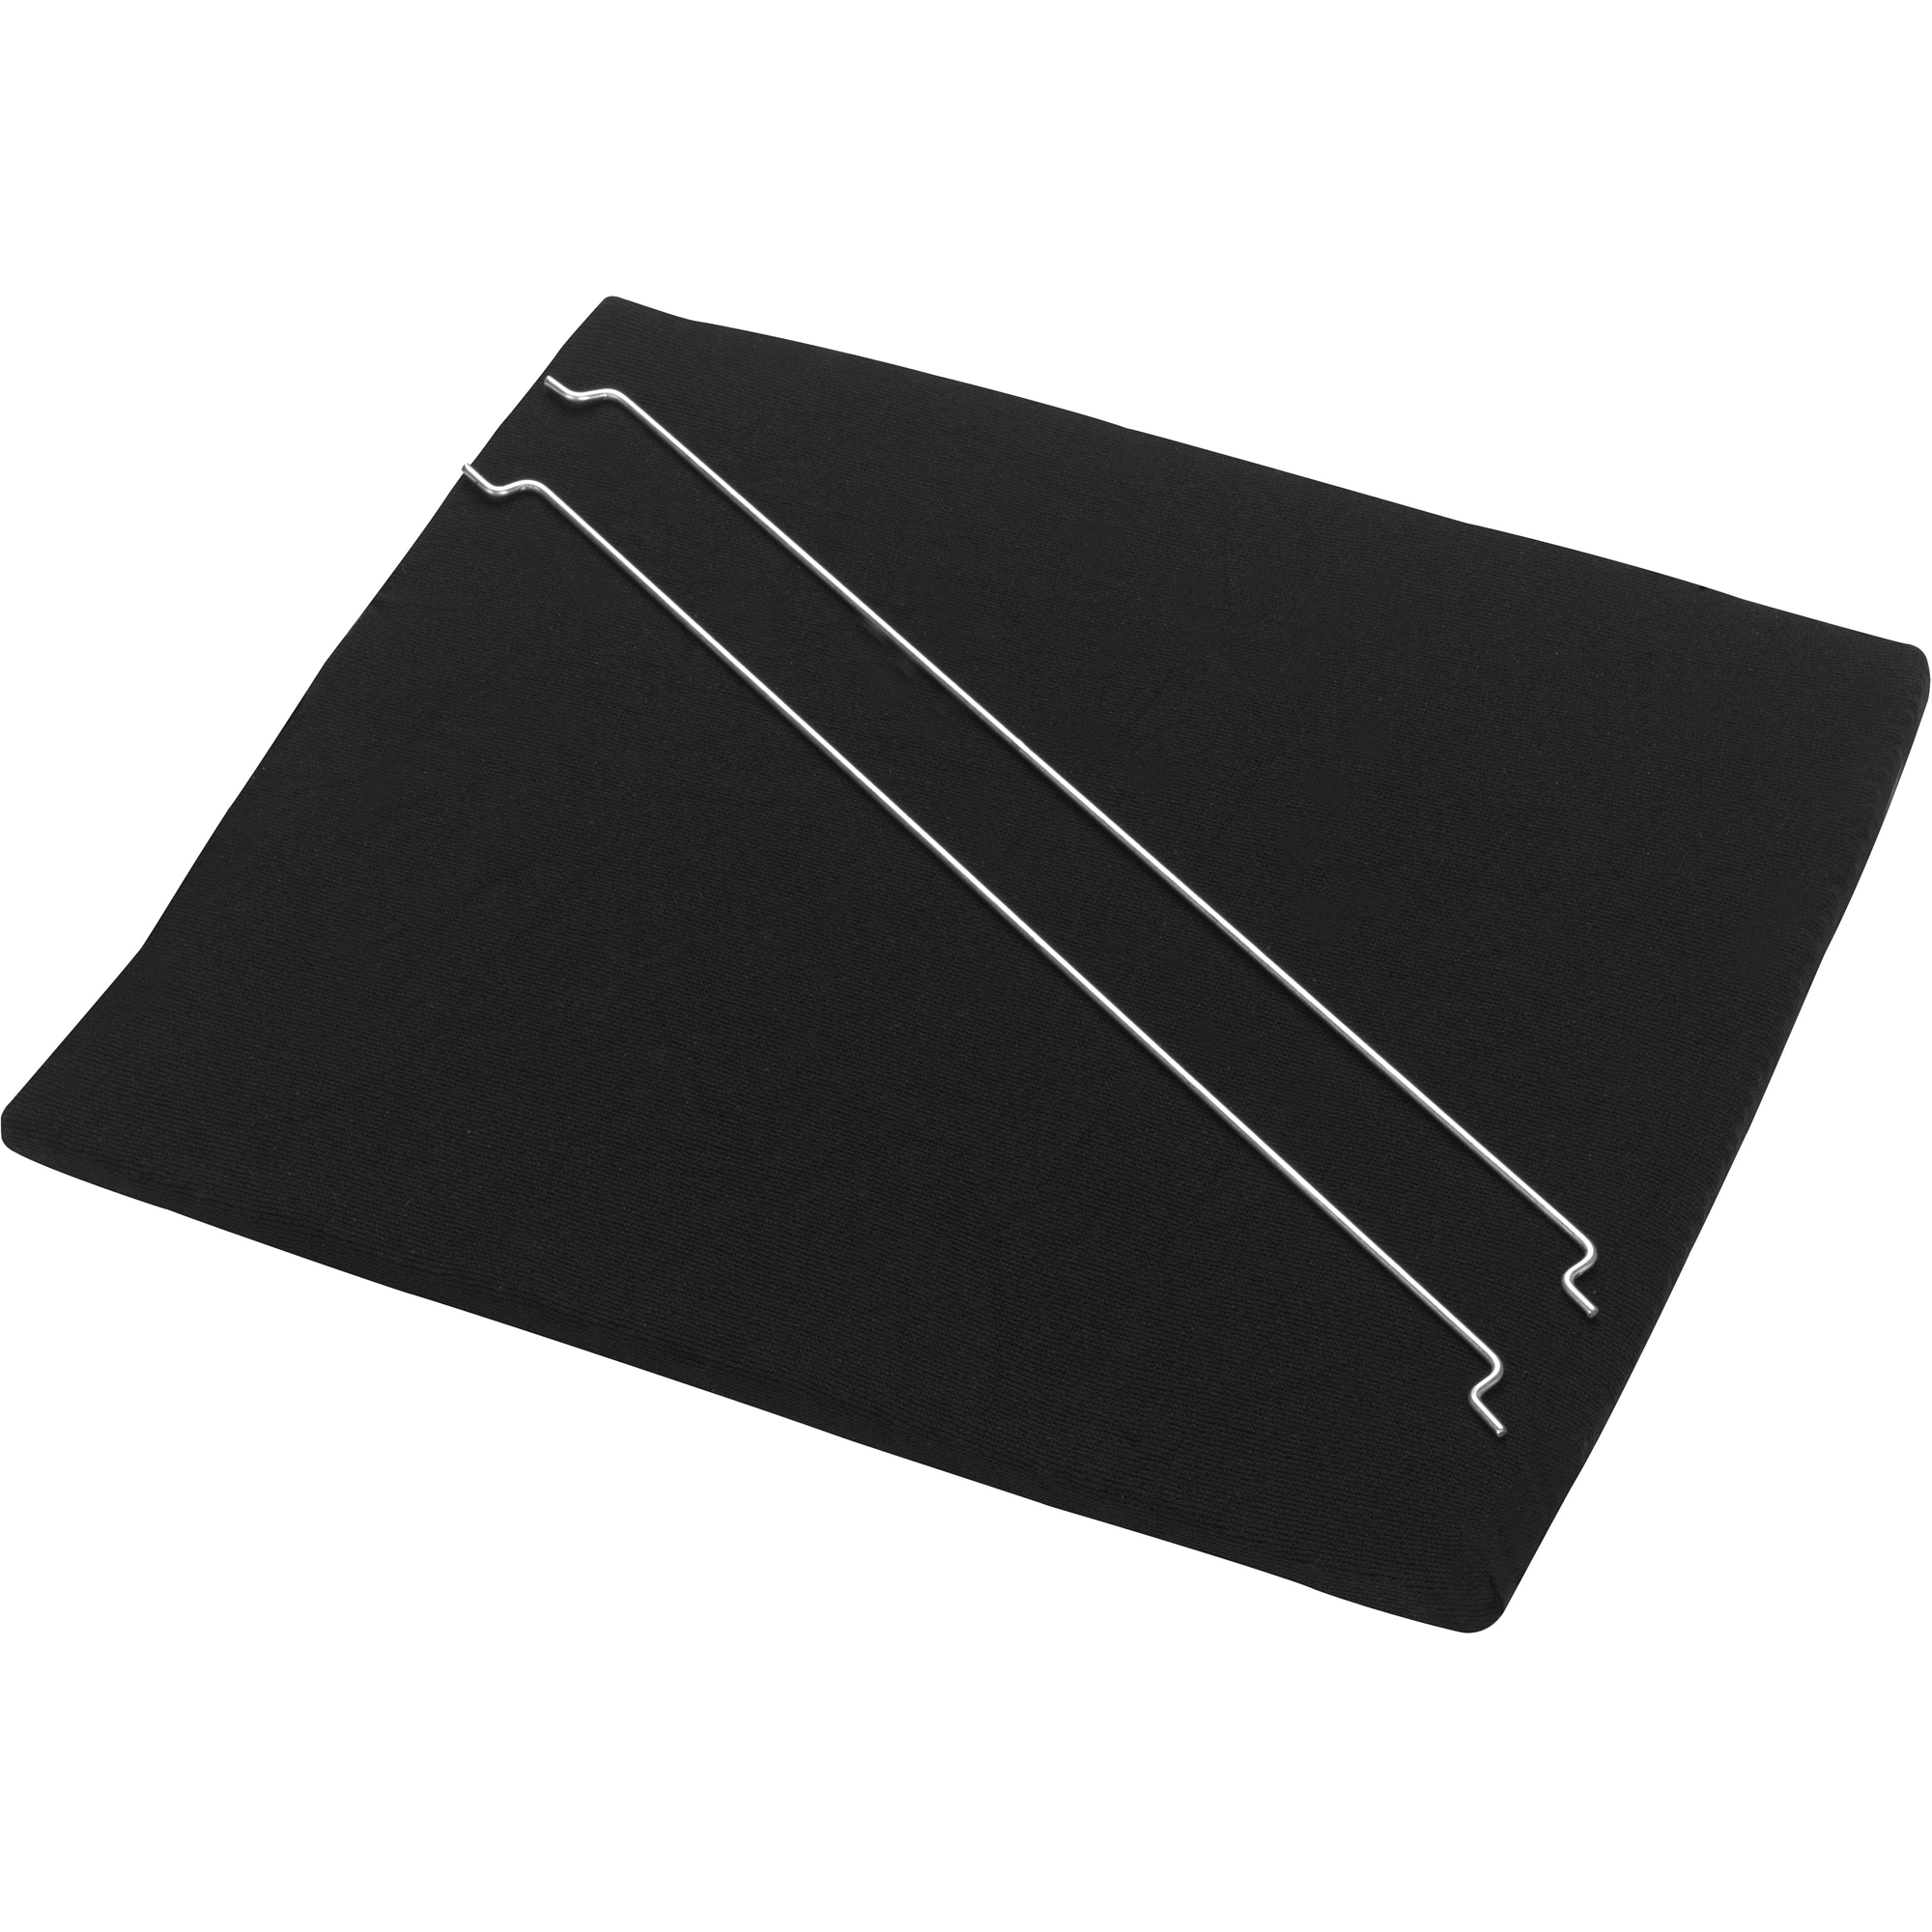 filtres de hottes filtre charbon filtre a charbon whirlpool bauknecht ikea fil950 1. Black Bedroom Furniture Sets. Home Design Ideas